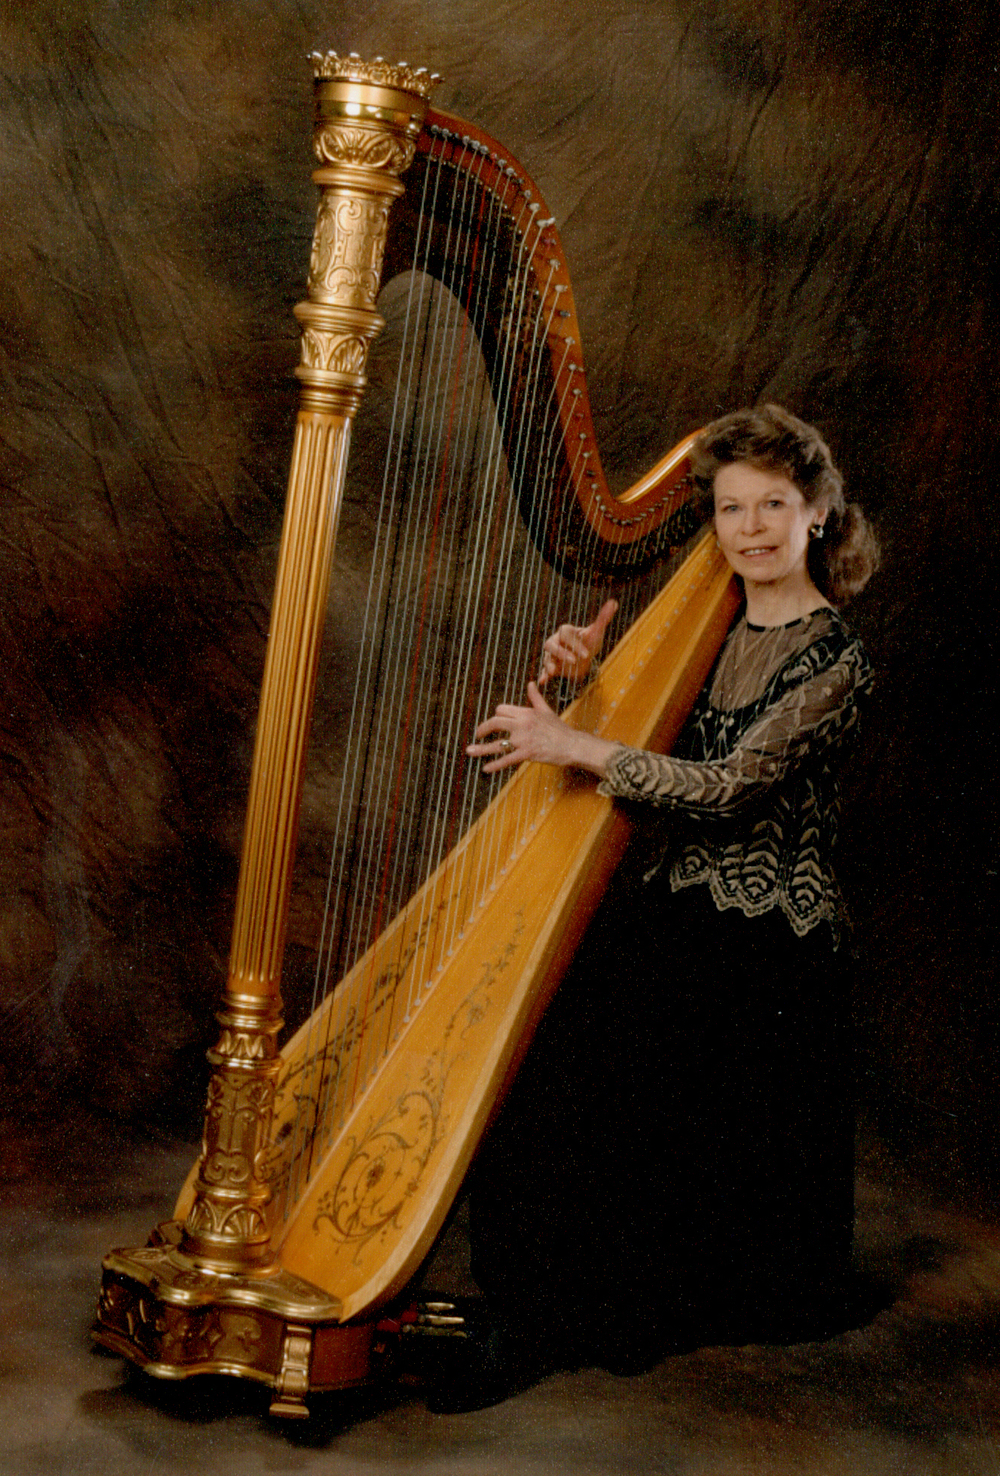 Love my harp